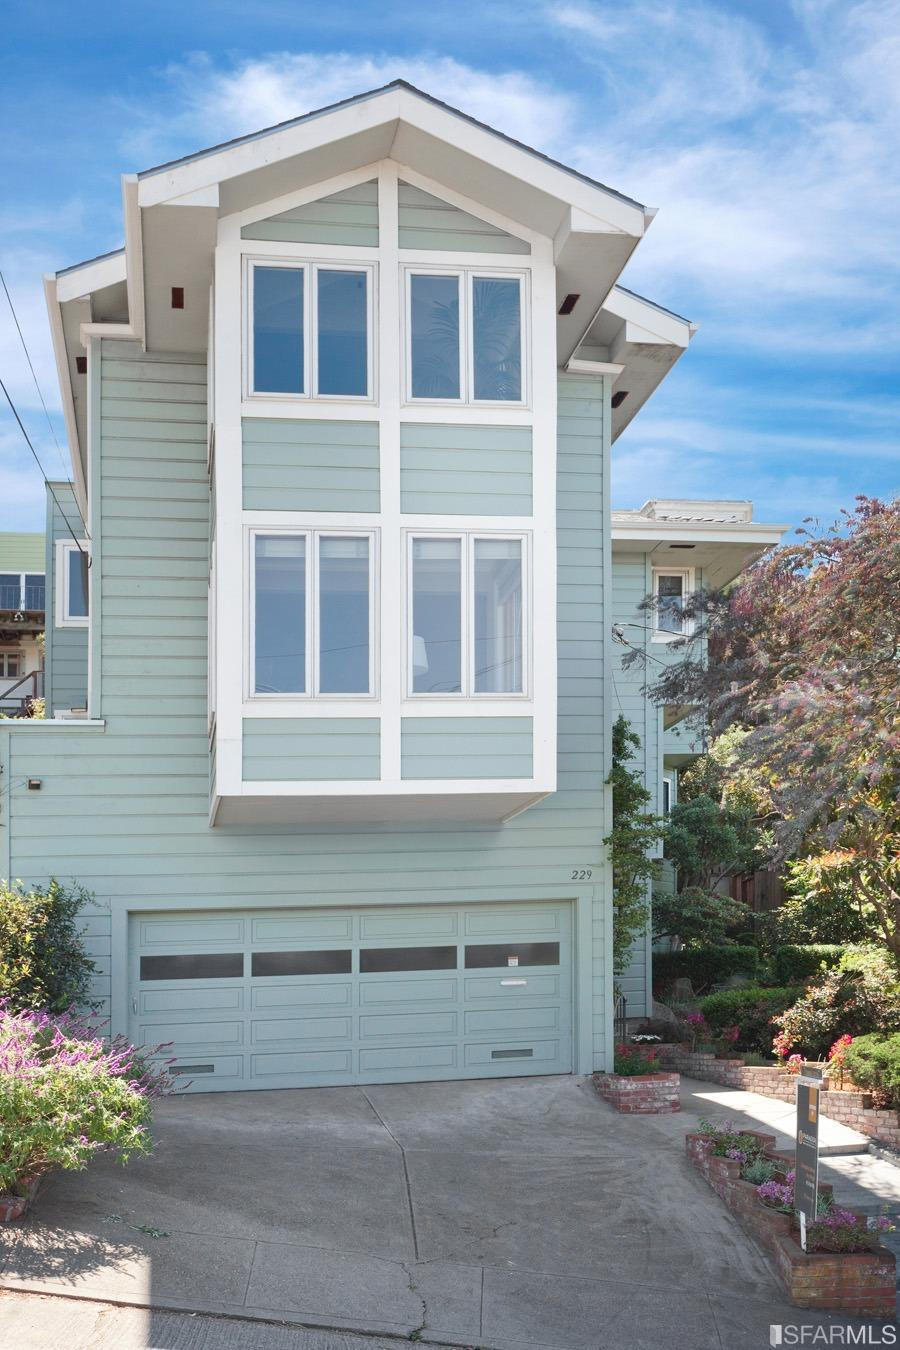 229 Montcalm St, San Francisco, CA